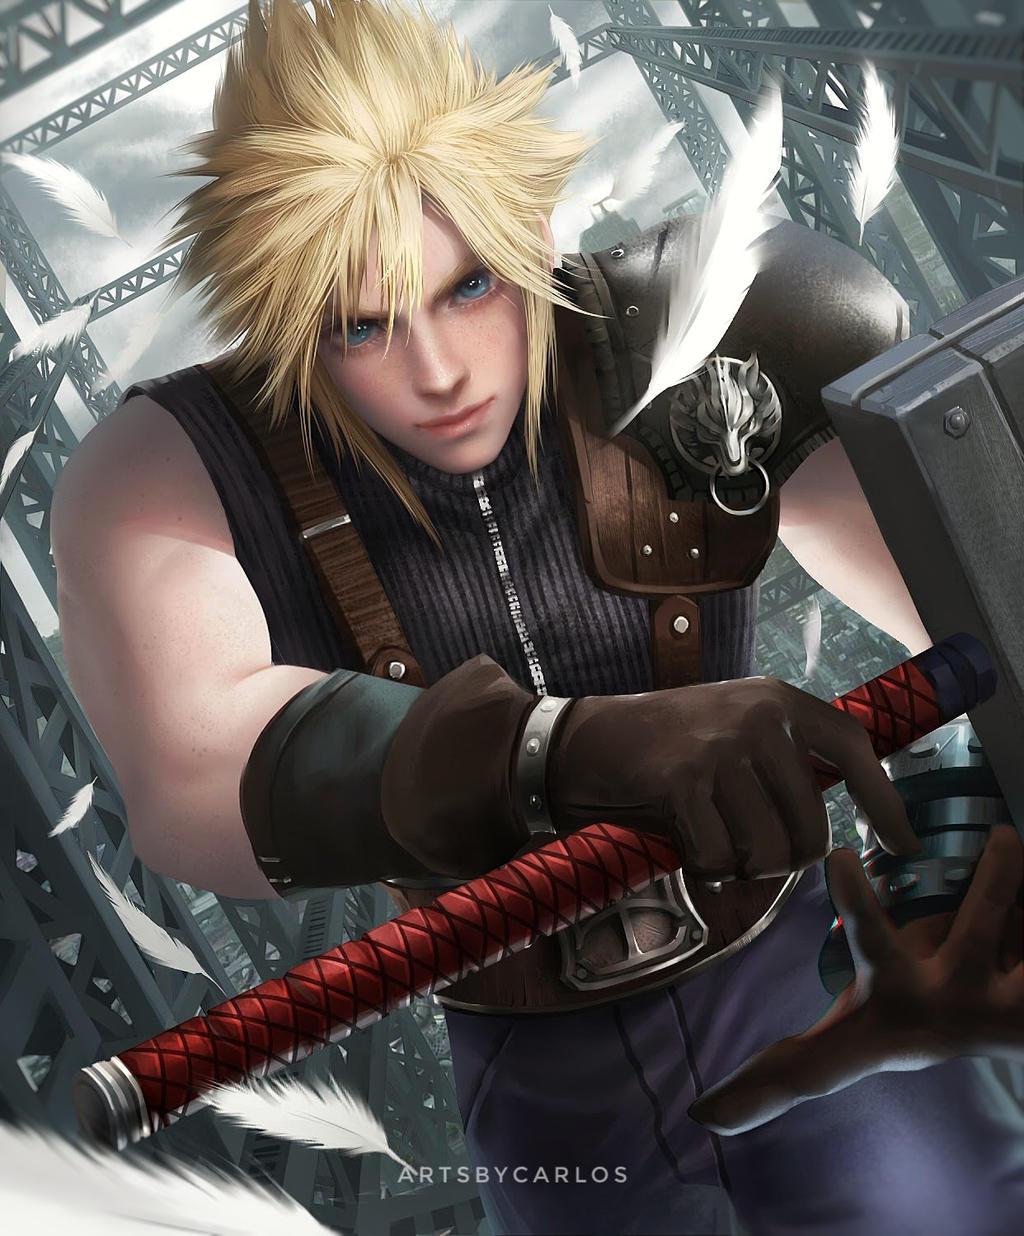 Final Fantasy Cloud Strife Wallpaper: Cloud Strife By Artsbycarlos On DeviantArt